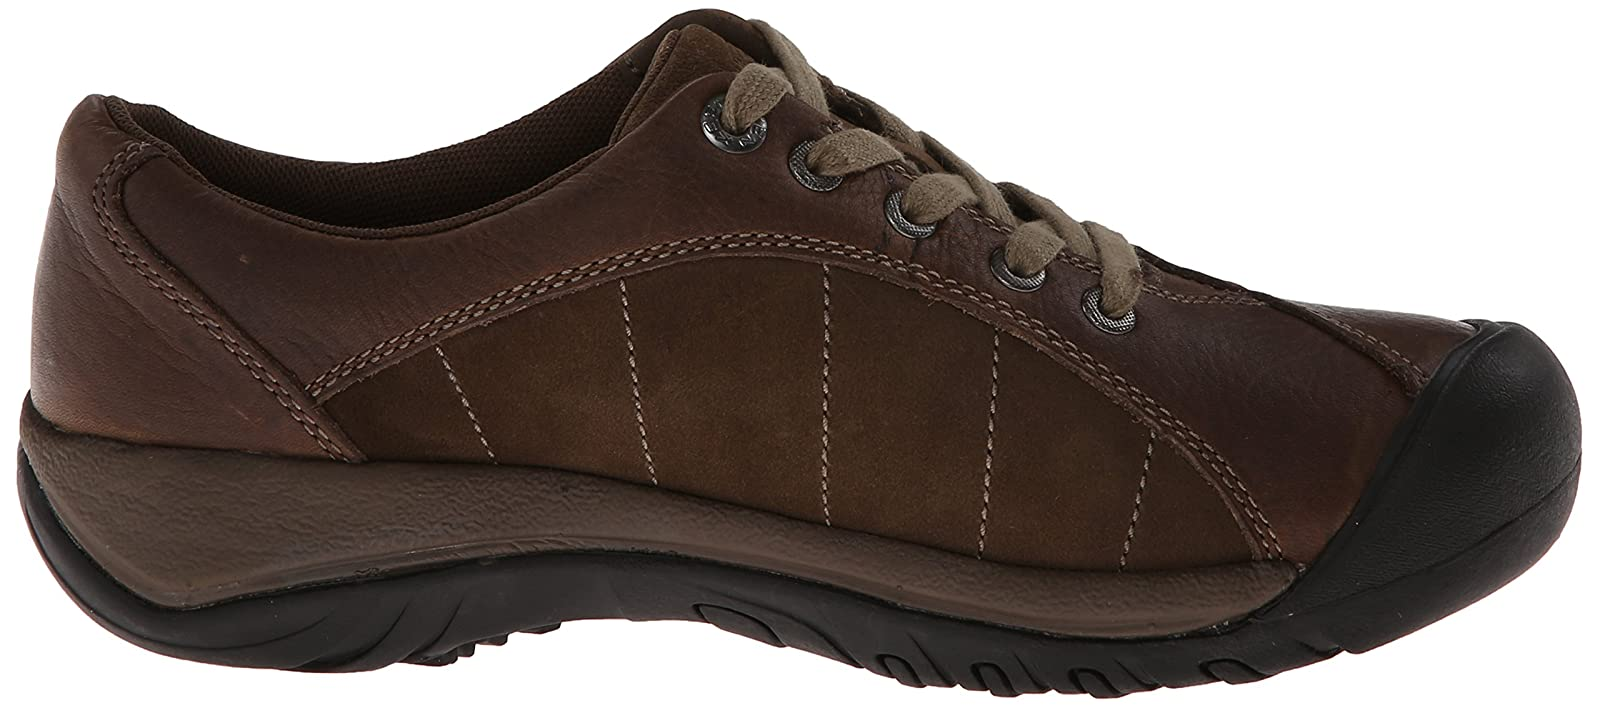 KEEN Women's Presidio Shoe Cascade Brown/Shitake 9.5 M US Women - 7